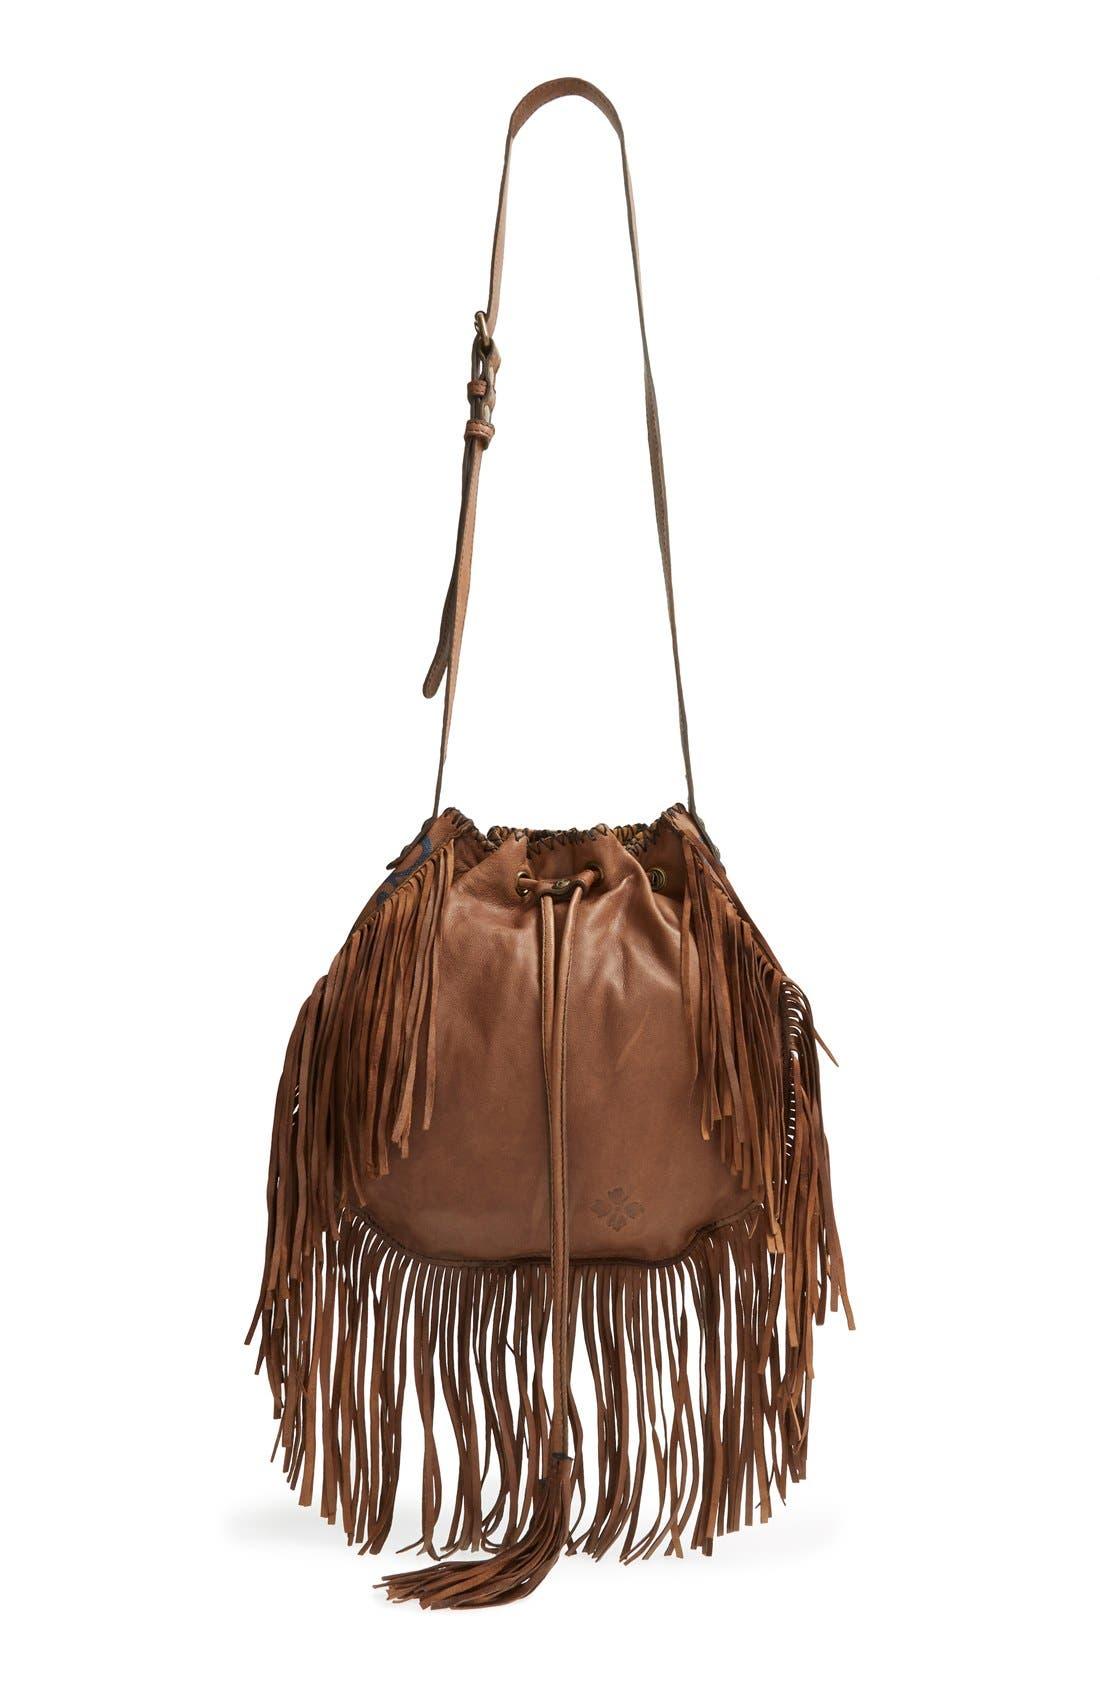 Alternate Image 1 Selected - Patricia Nash 'Carrara' Drawstring Leather Crossbody Bag